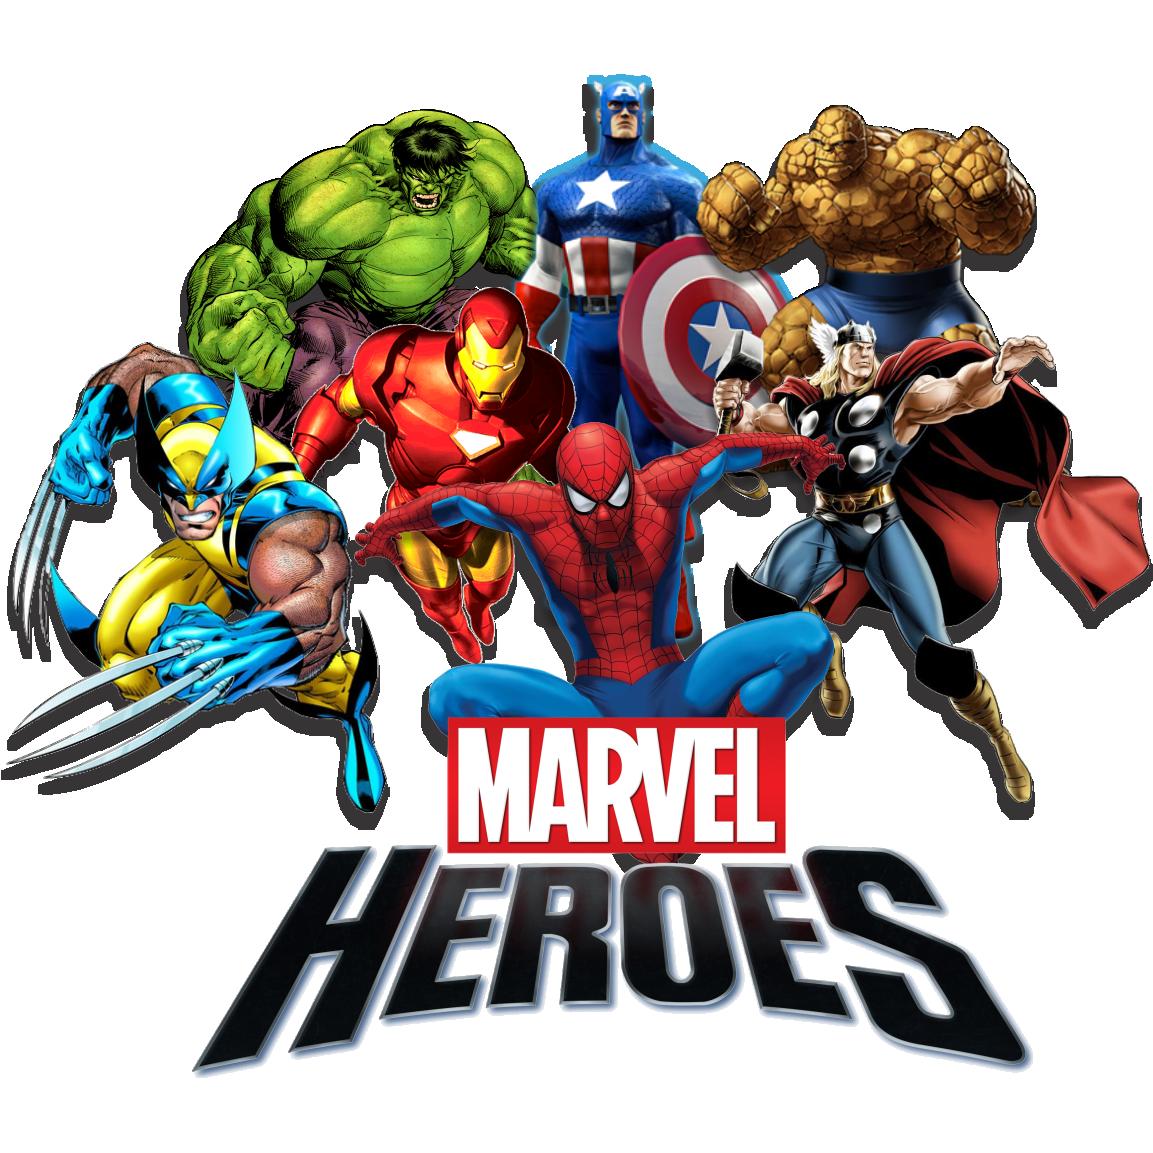 Deadpool Bruce Spider Man Heroes 2016 Banner Vision Avengers Cartoon Superhero Images Marvel Comics Superheroes